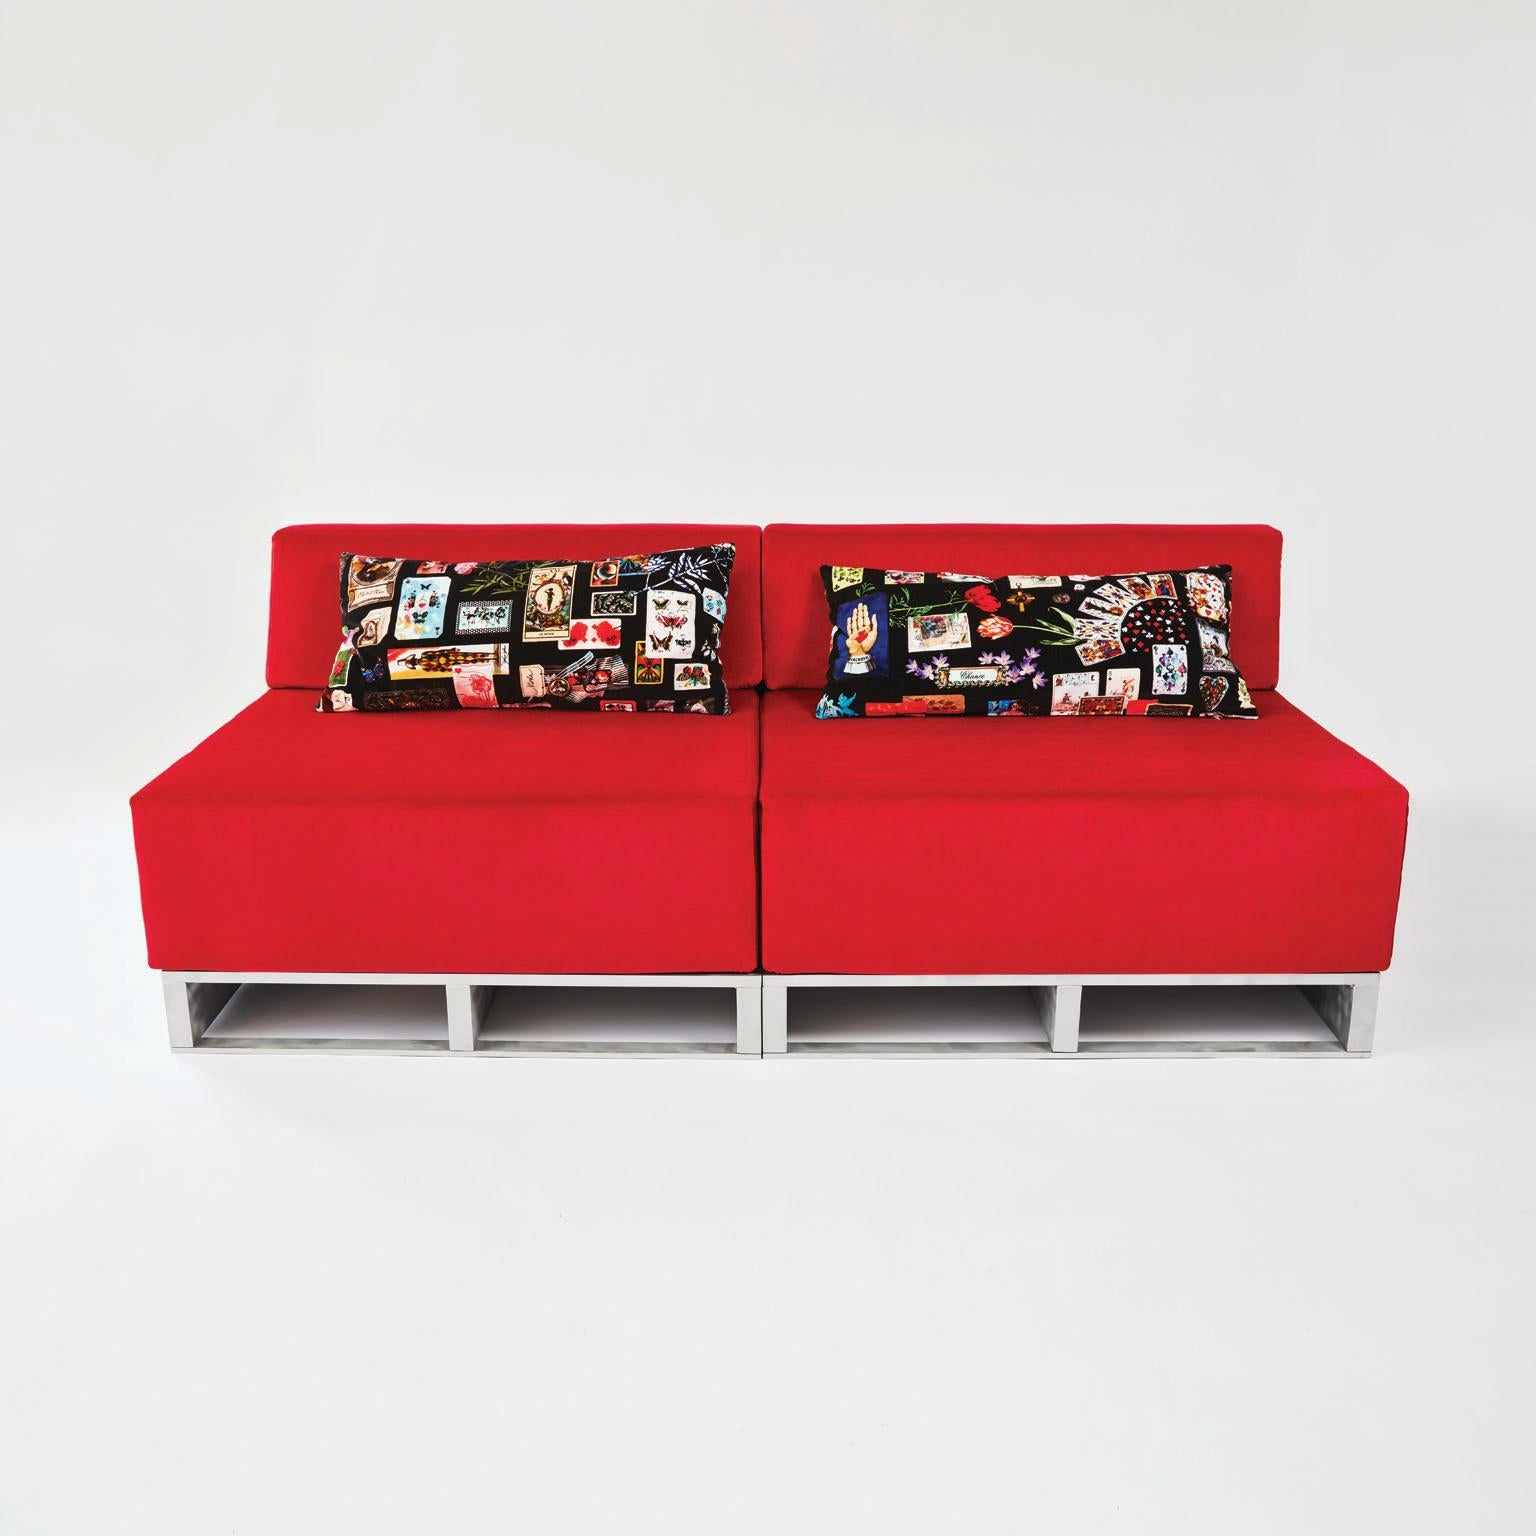 Contemporary Modular Sofa Indoor Outdoor In Red Fabric On Aluminum Base